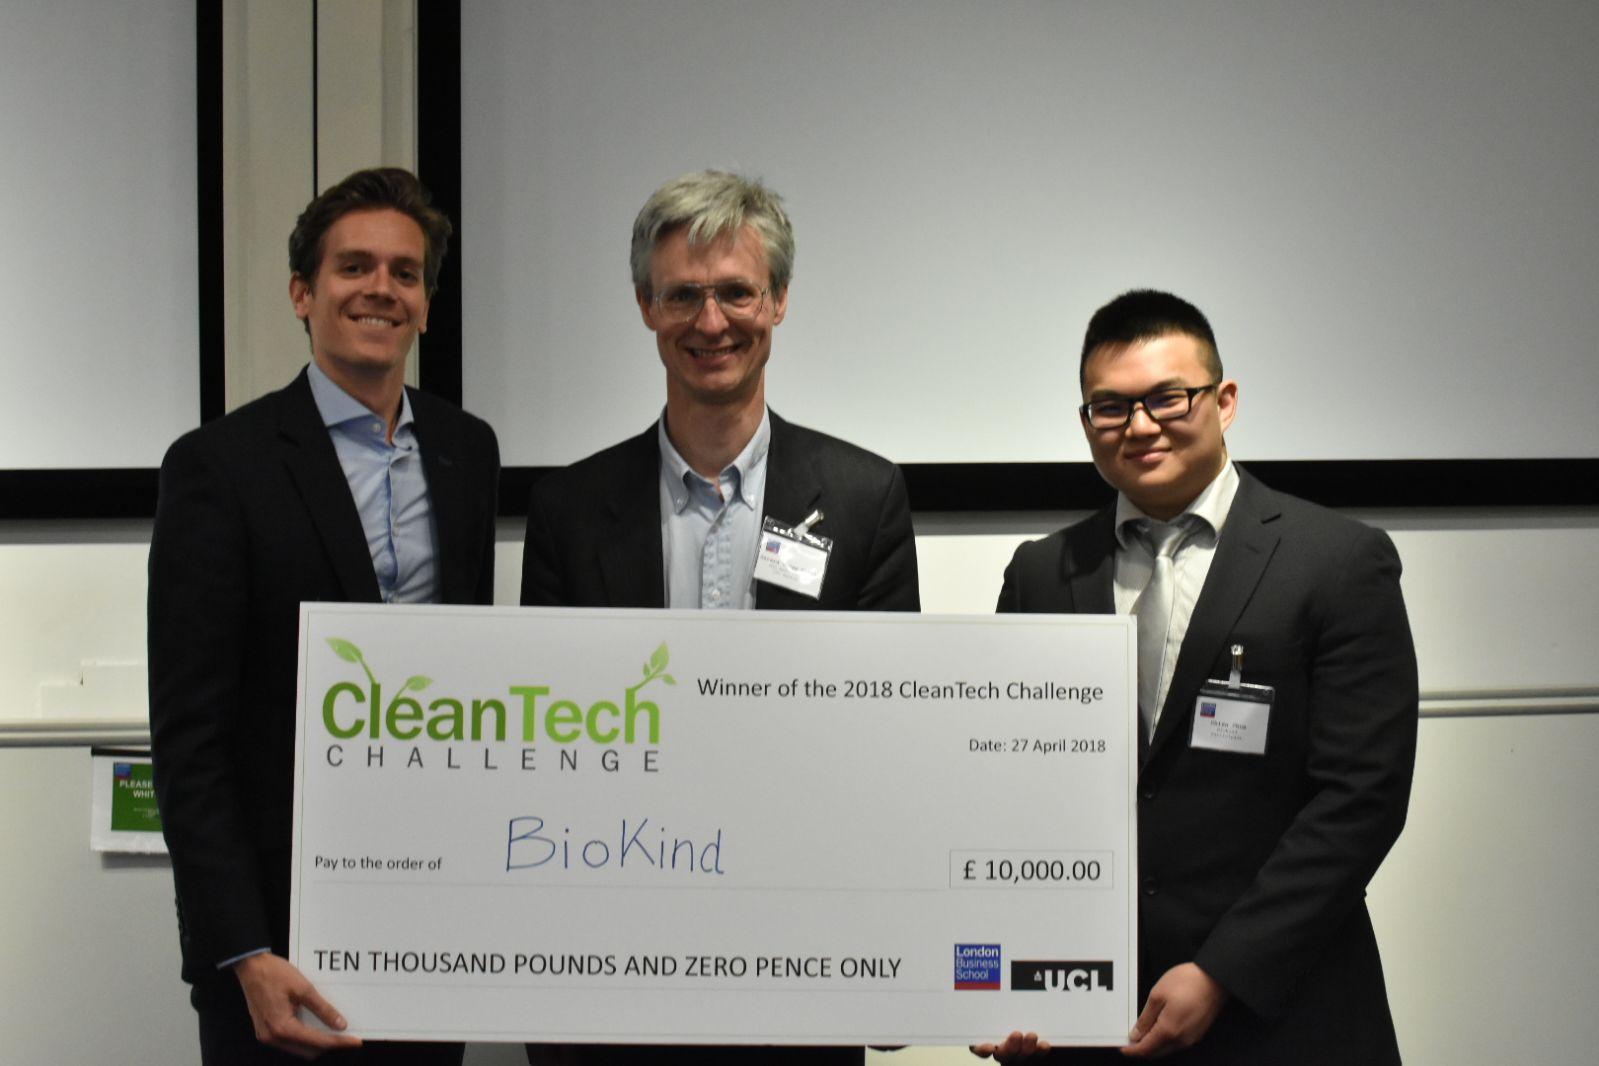 London Business School's CleanTech Challenge 2018 – 1st Place Winner